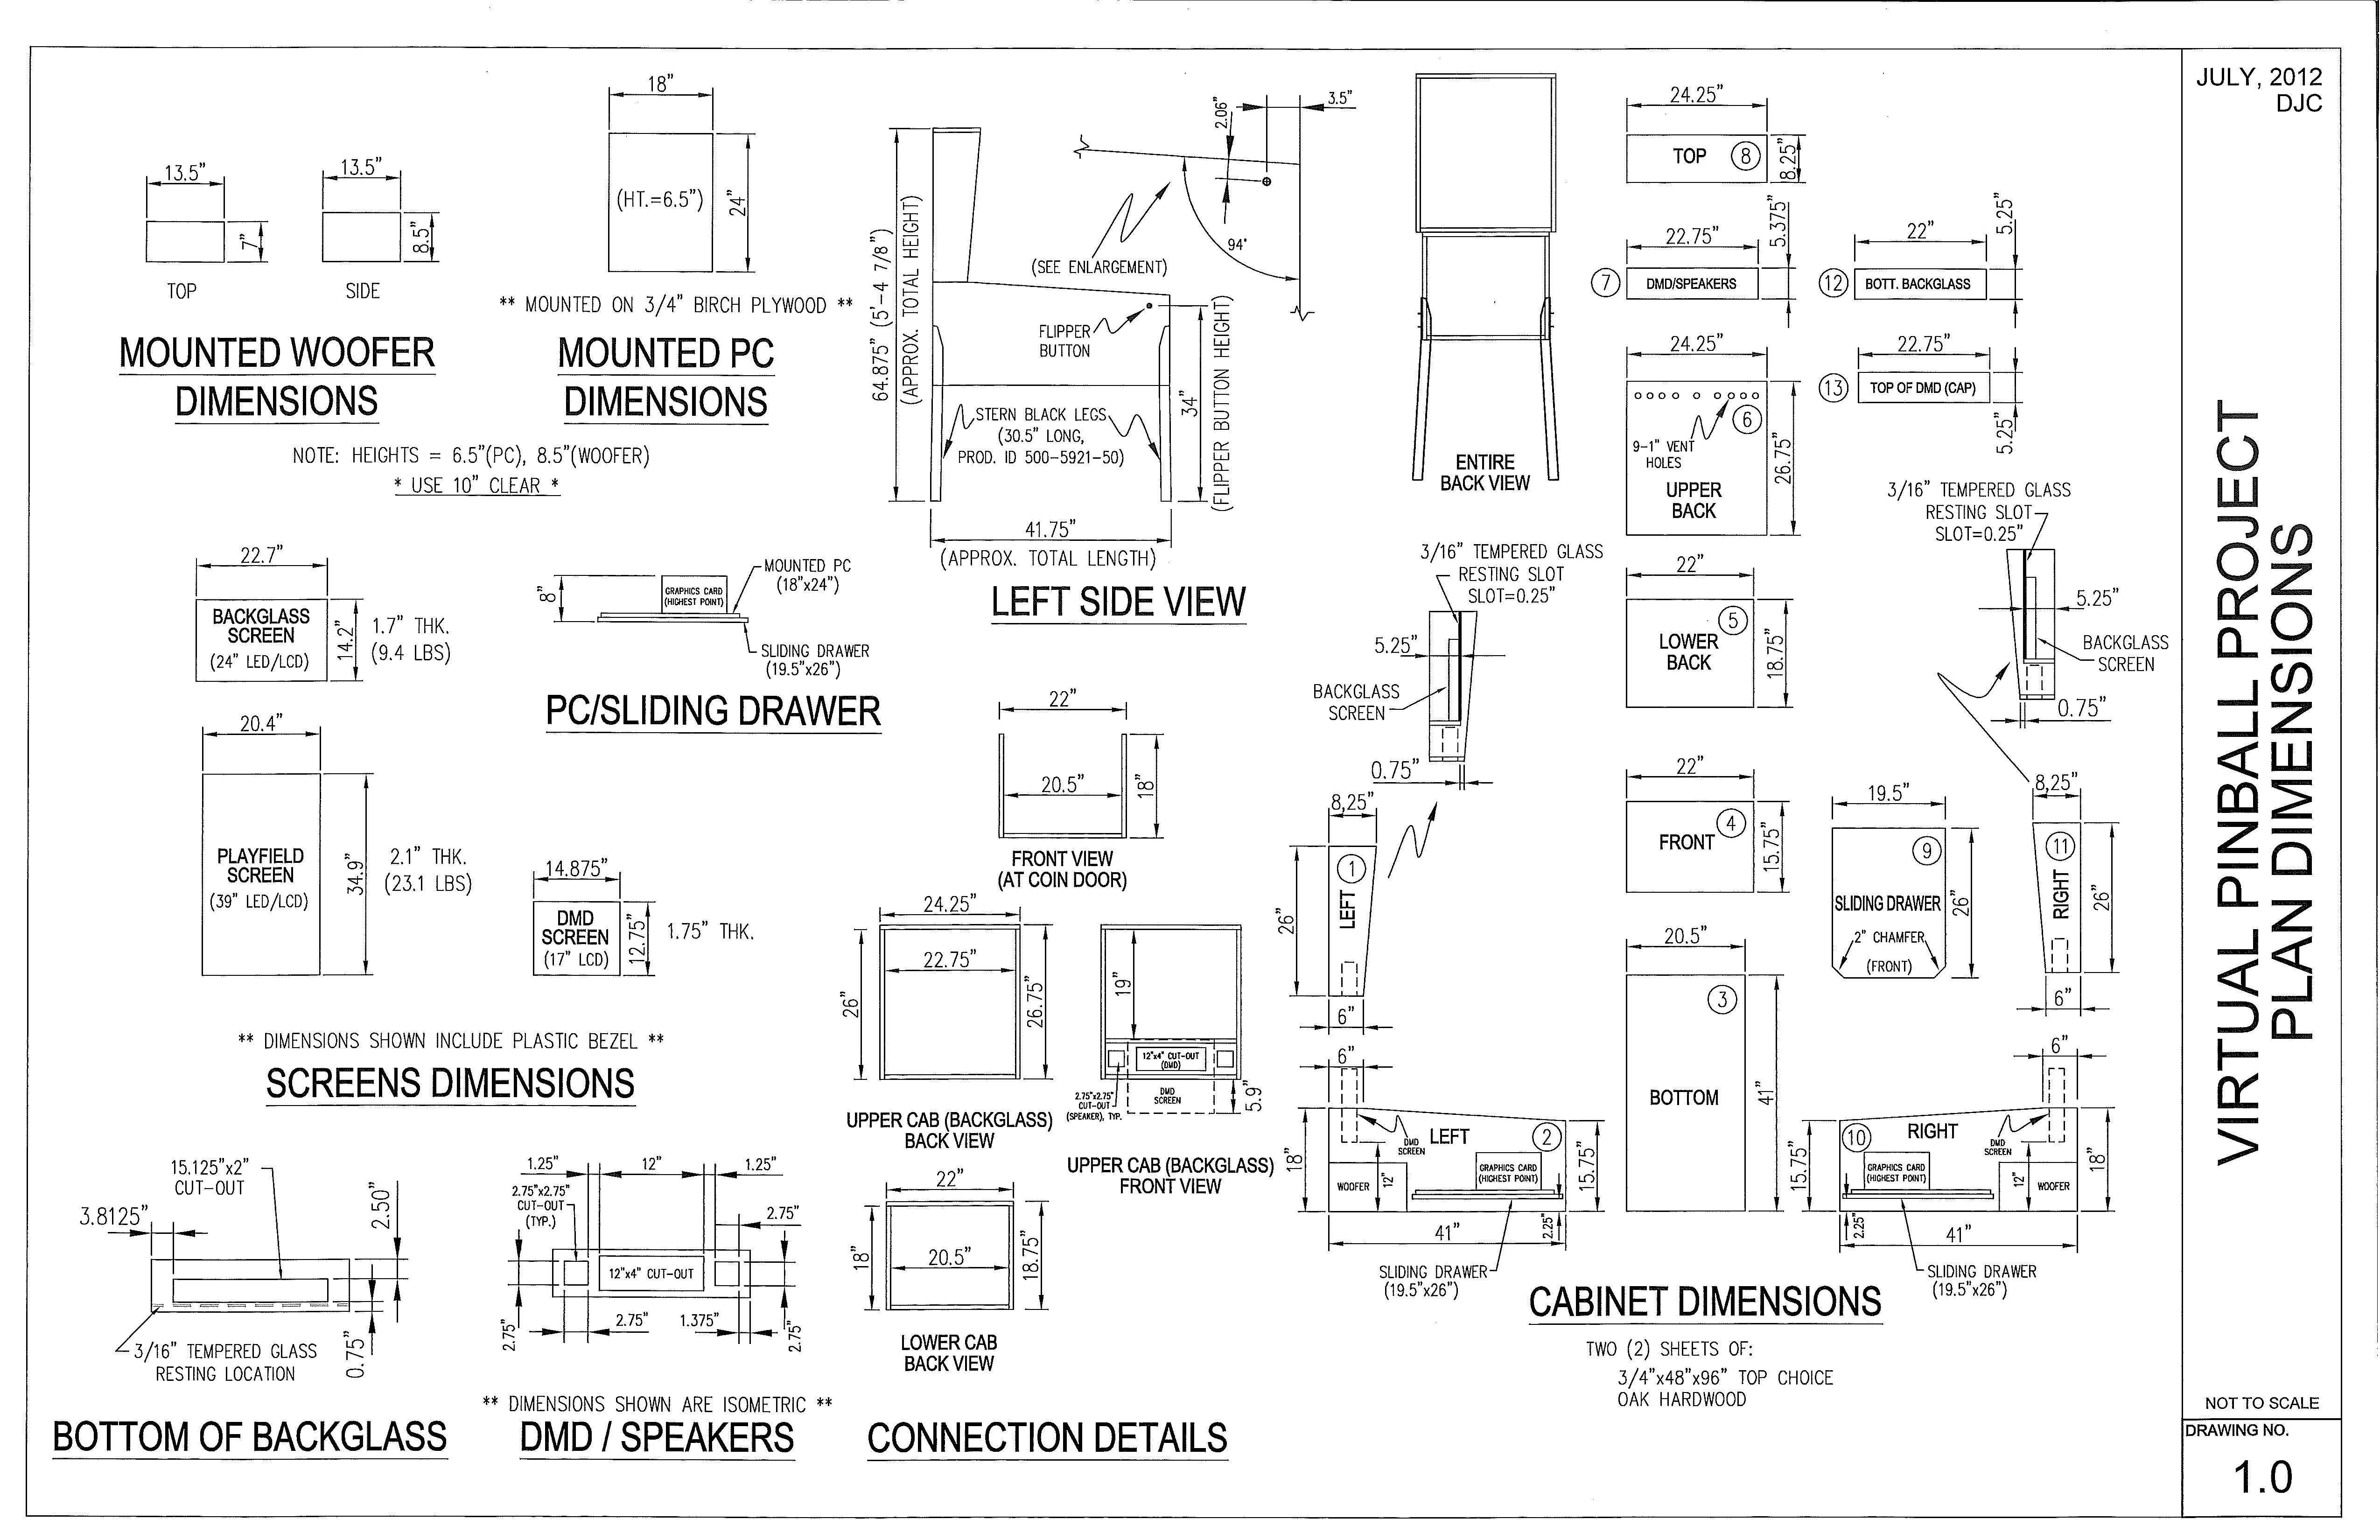 Woodwork Diy Cabinets Plans Pdf Plans Cabinet Plans Diy Cabinets Downloadable Woodworking Plans